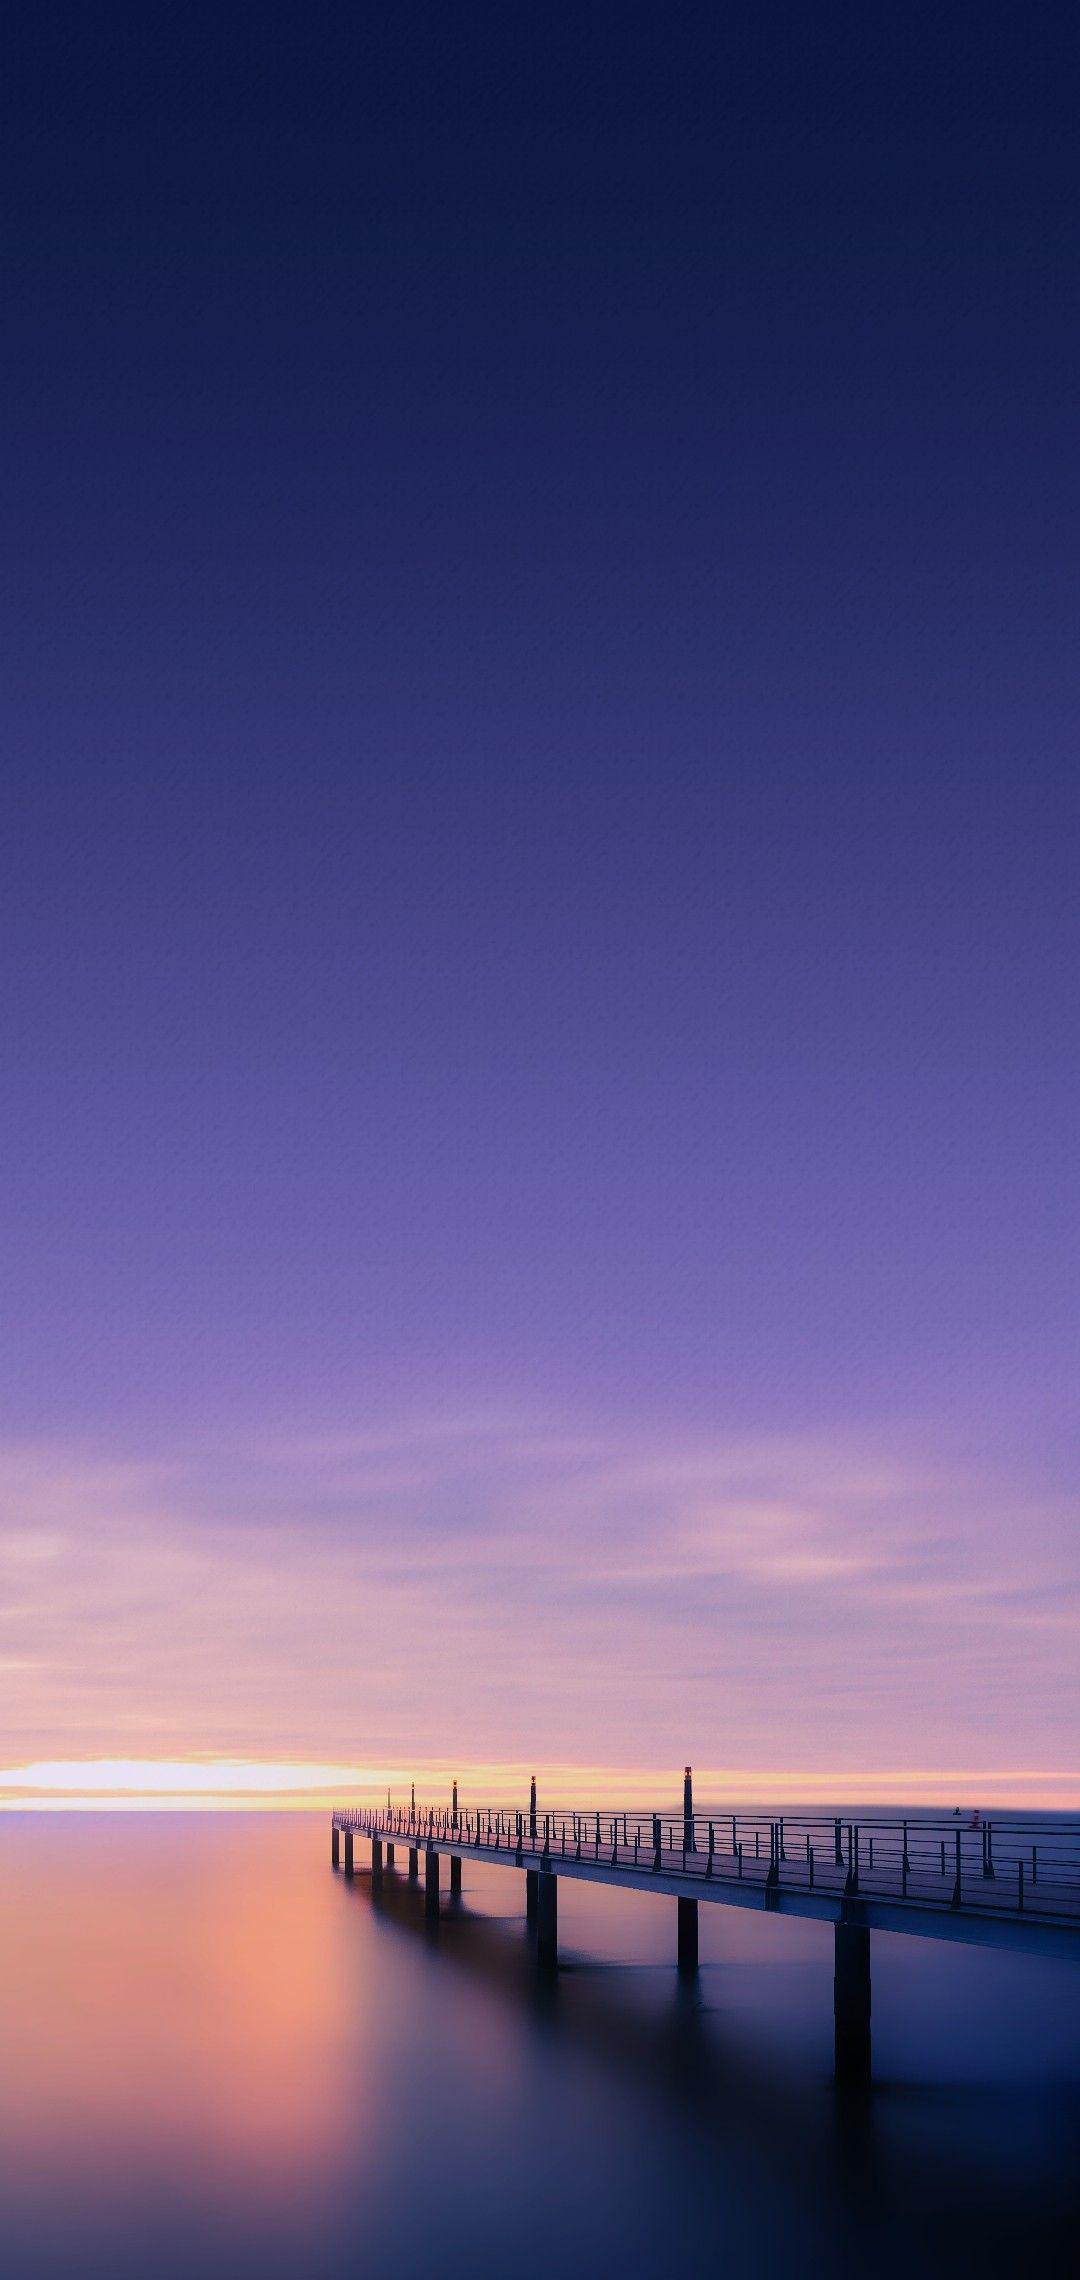 Night Sky Blue Ocean Wallpaper Clean Galaxy Colour Digital Art S8 Walls Samsu Papel De Parede Samsung Samsung Papel De Parede Papeis De Parede Azuis